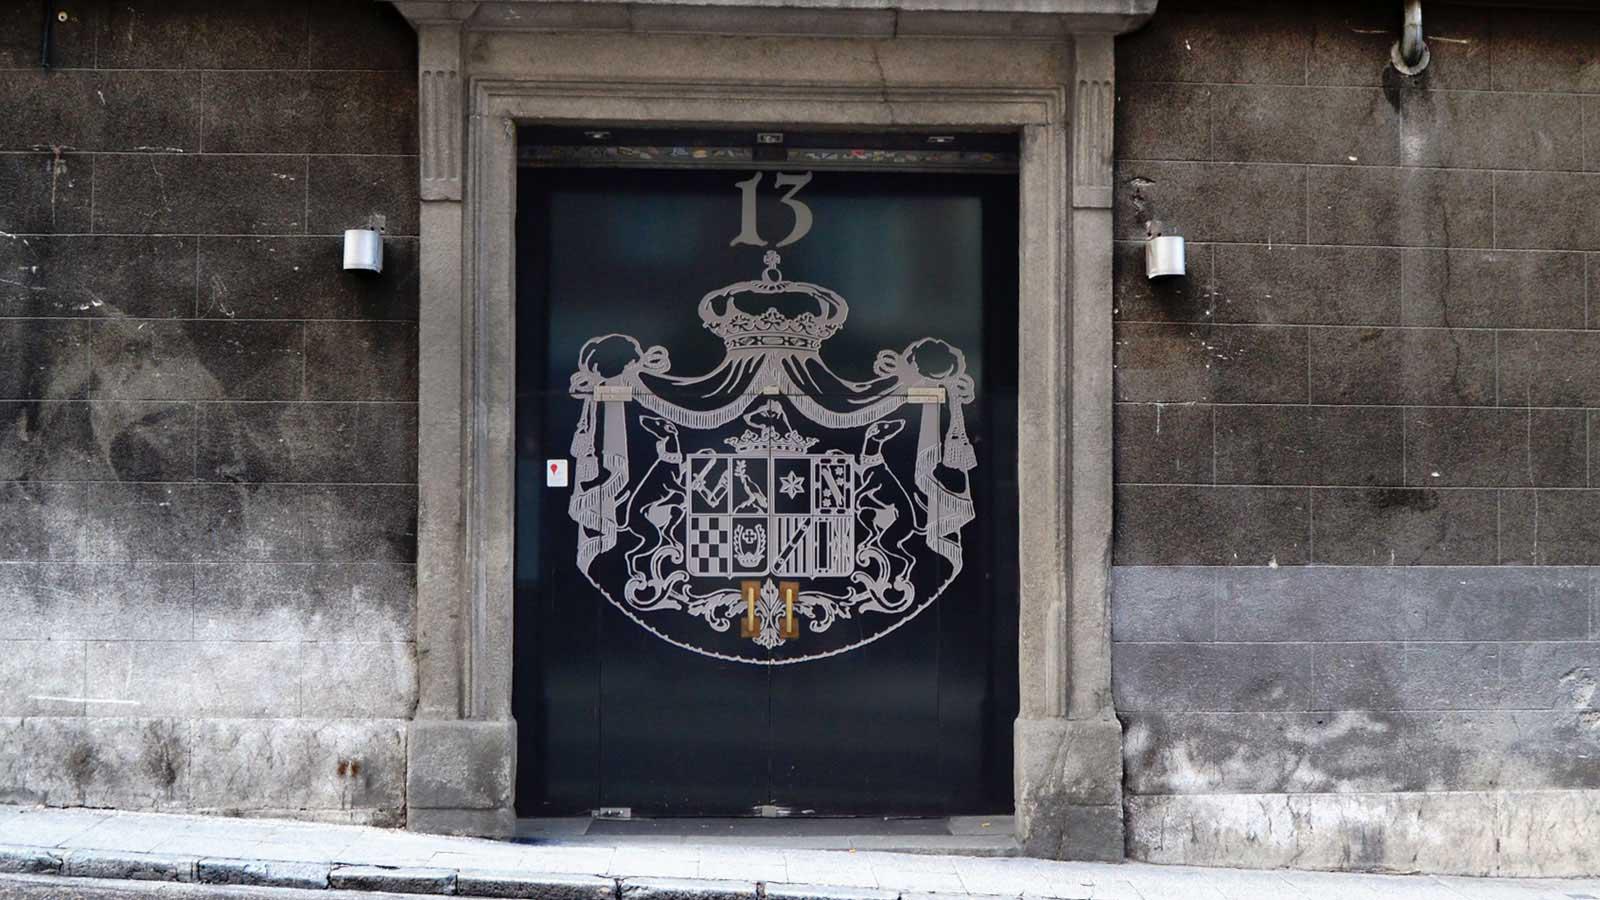 Palacio de anglona